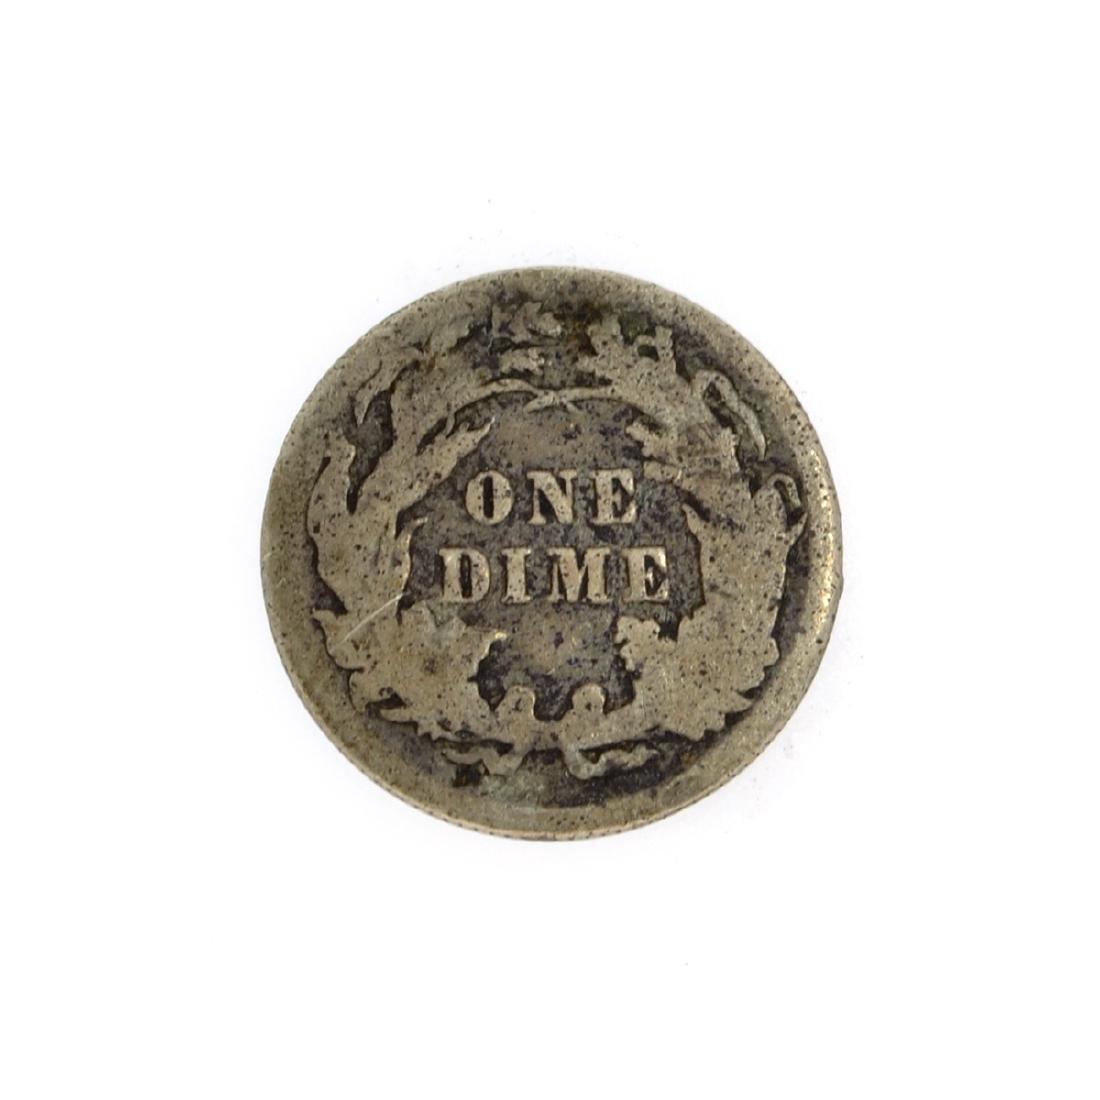 Rare 1887 Liberty Seated Dime Coin - 2